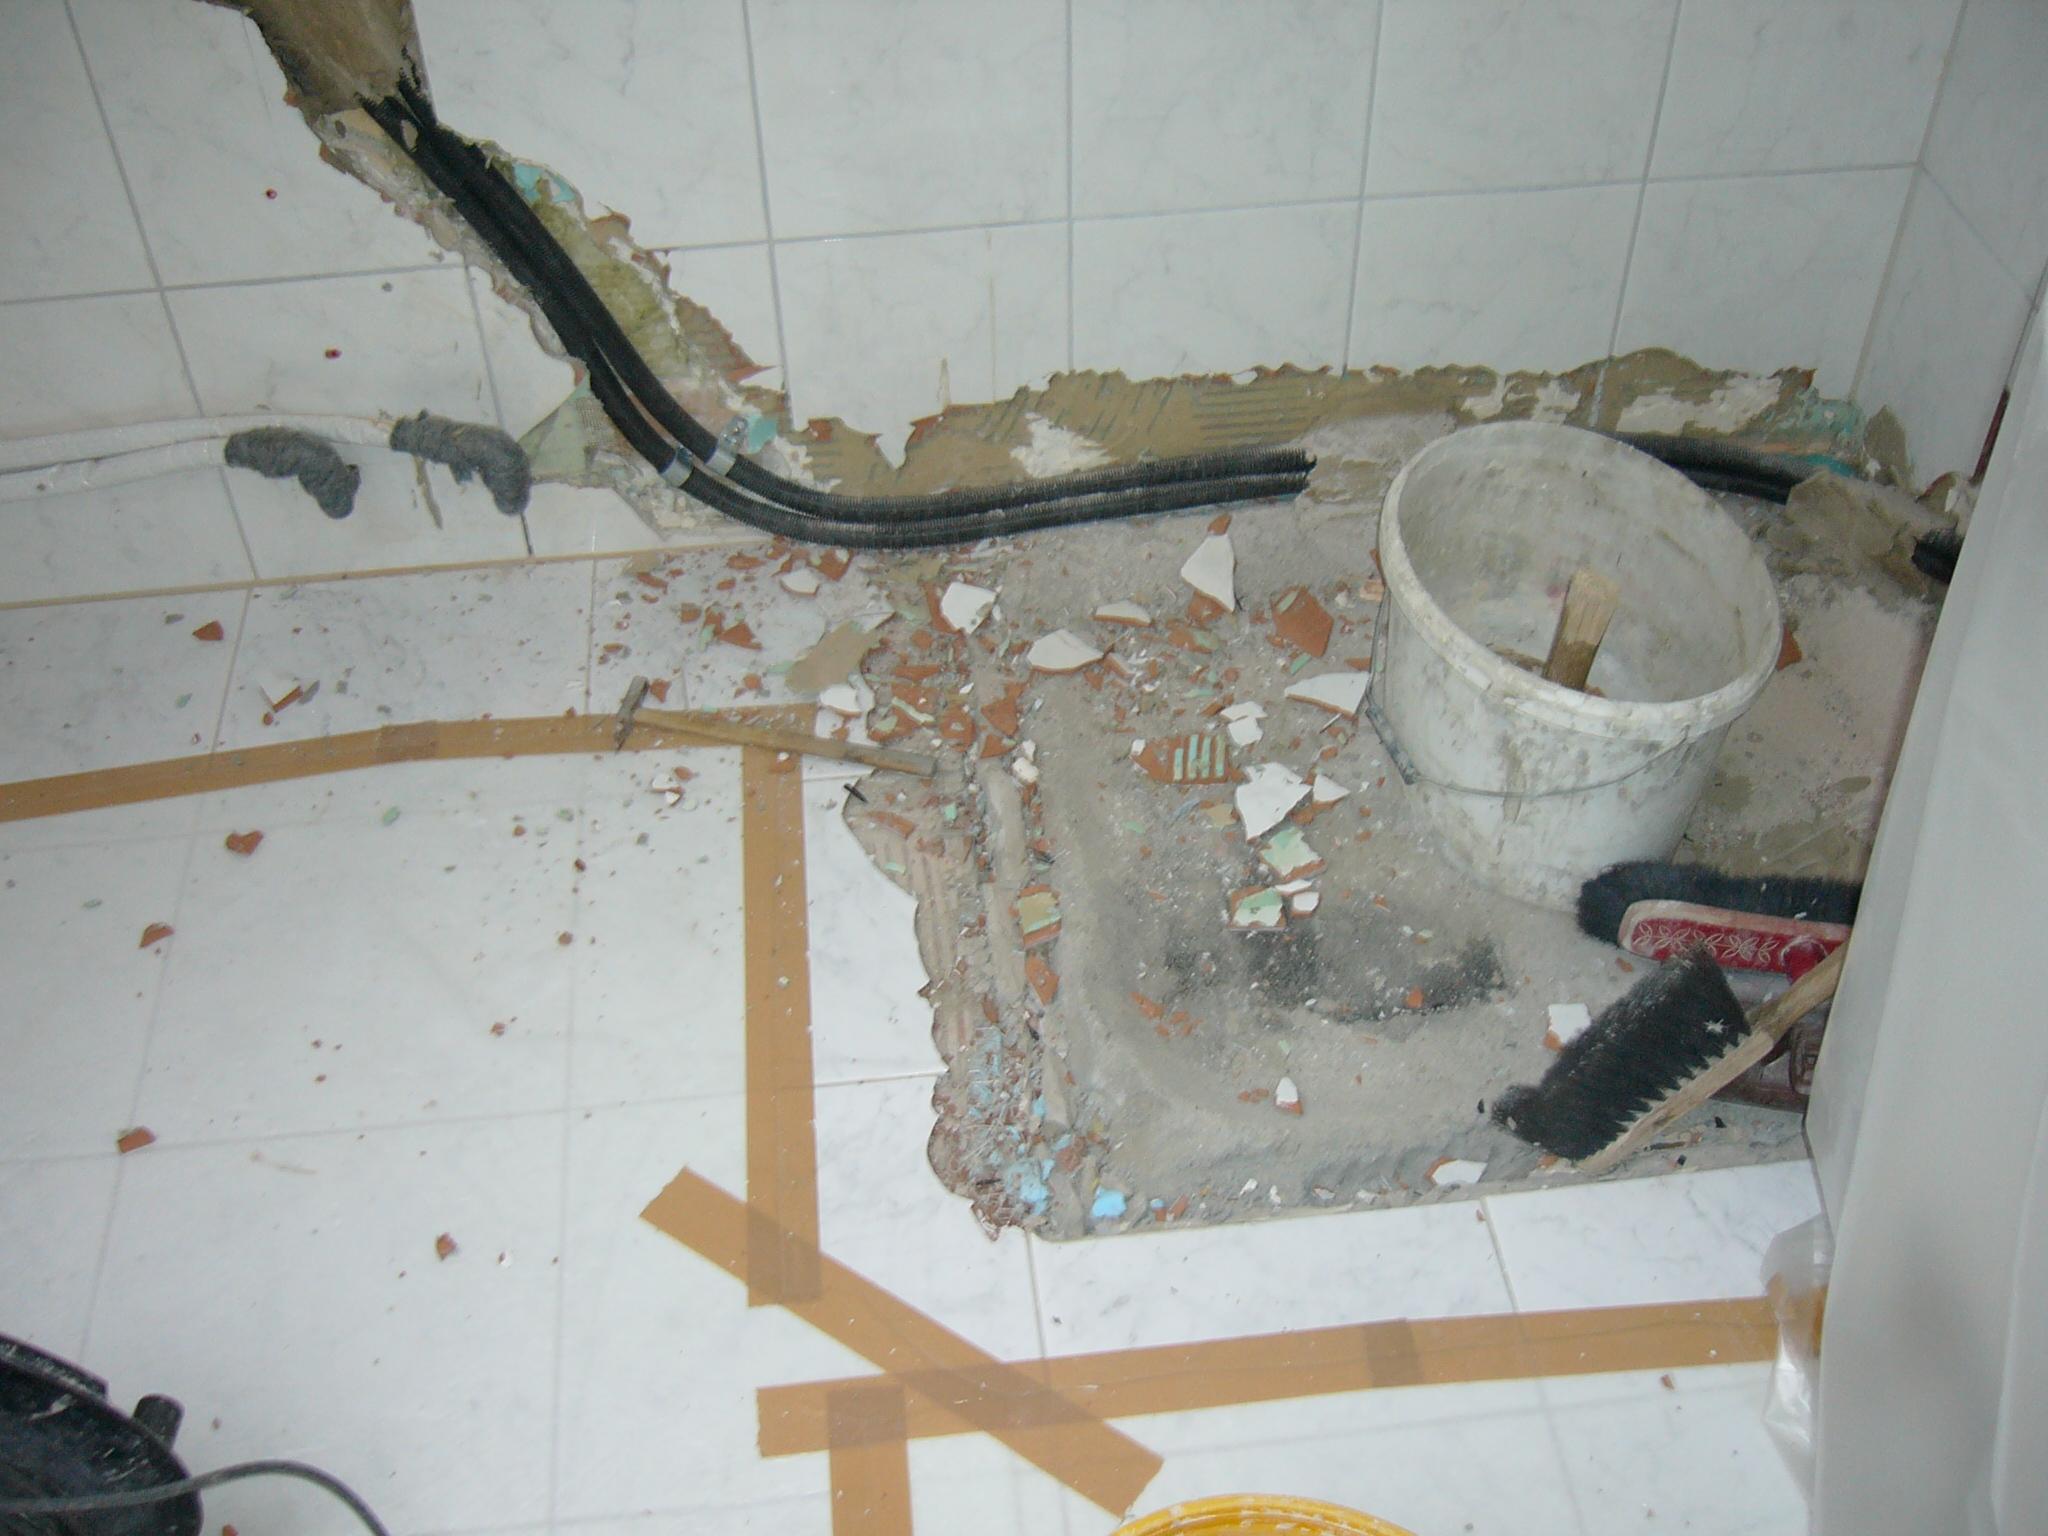 Wasserschaden: Sanierung Badezimmer - Plattenleger Plamenig